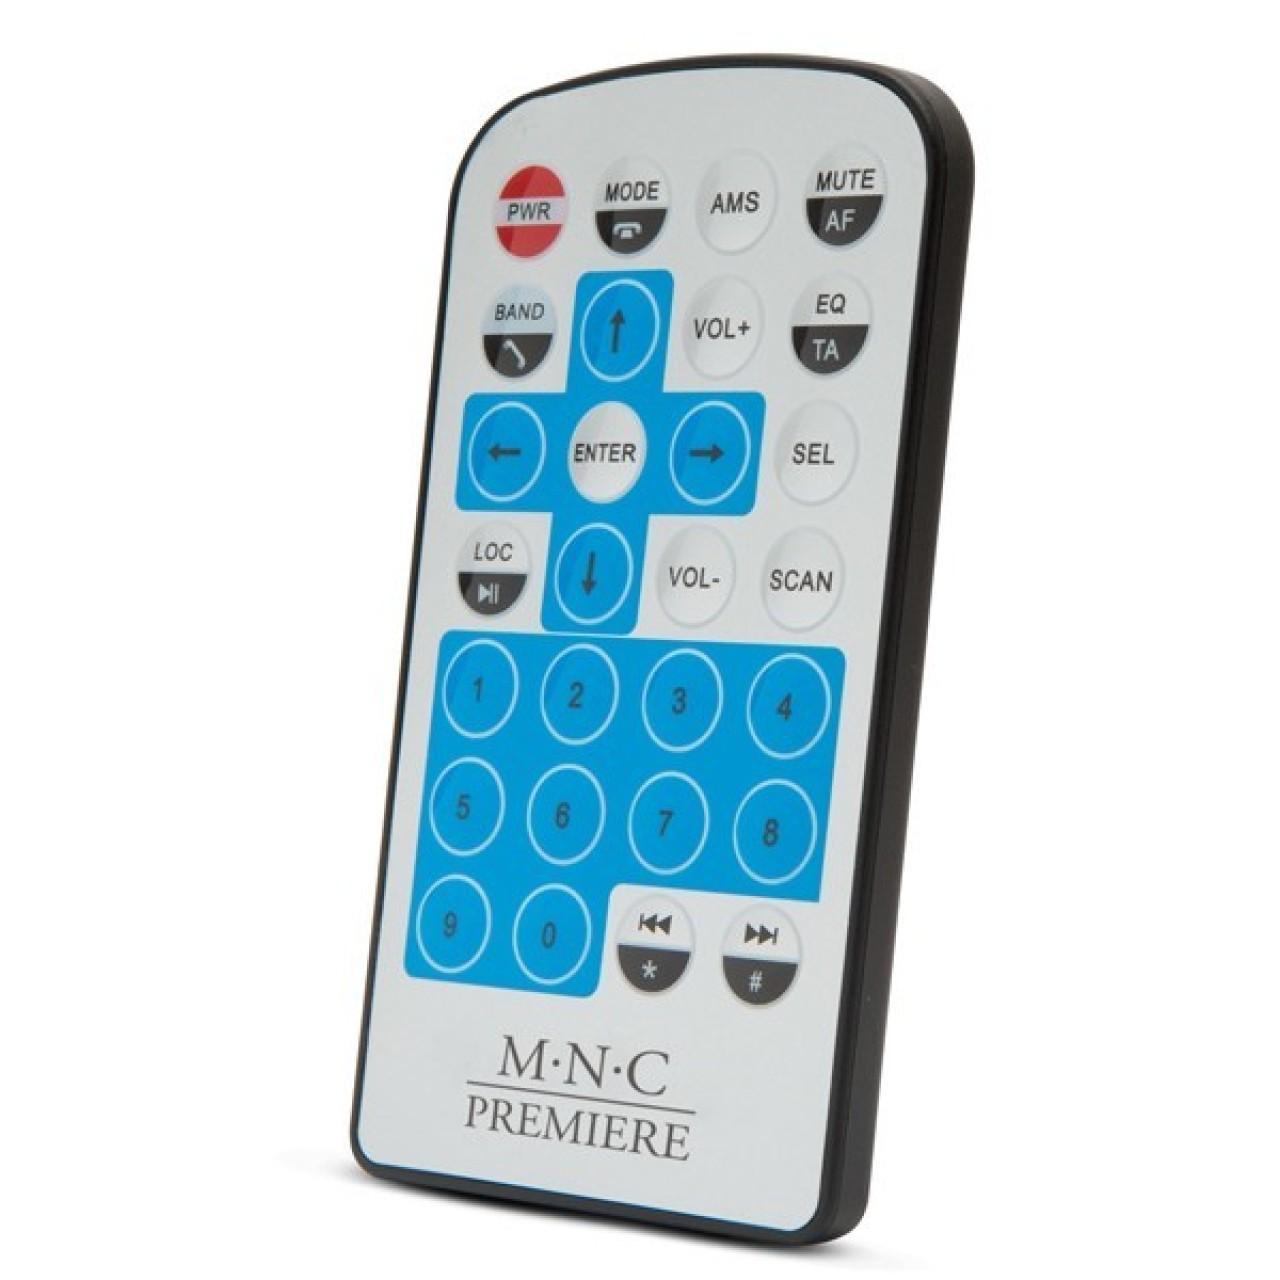 "Navigatie GPS 1DIN Ecran Retractabil 7"" Multimedia Player Auto, 4x45W, Wi-Fi M.N.C Premiere 39719"